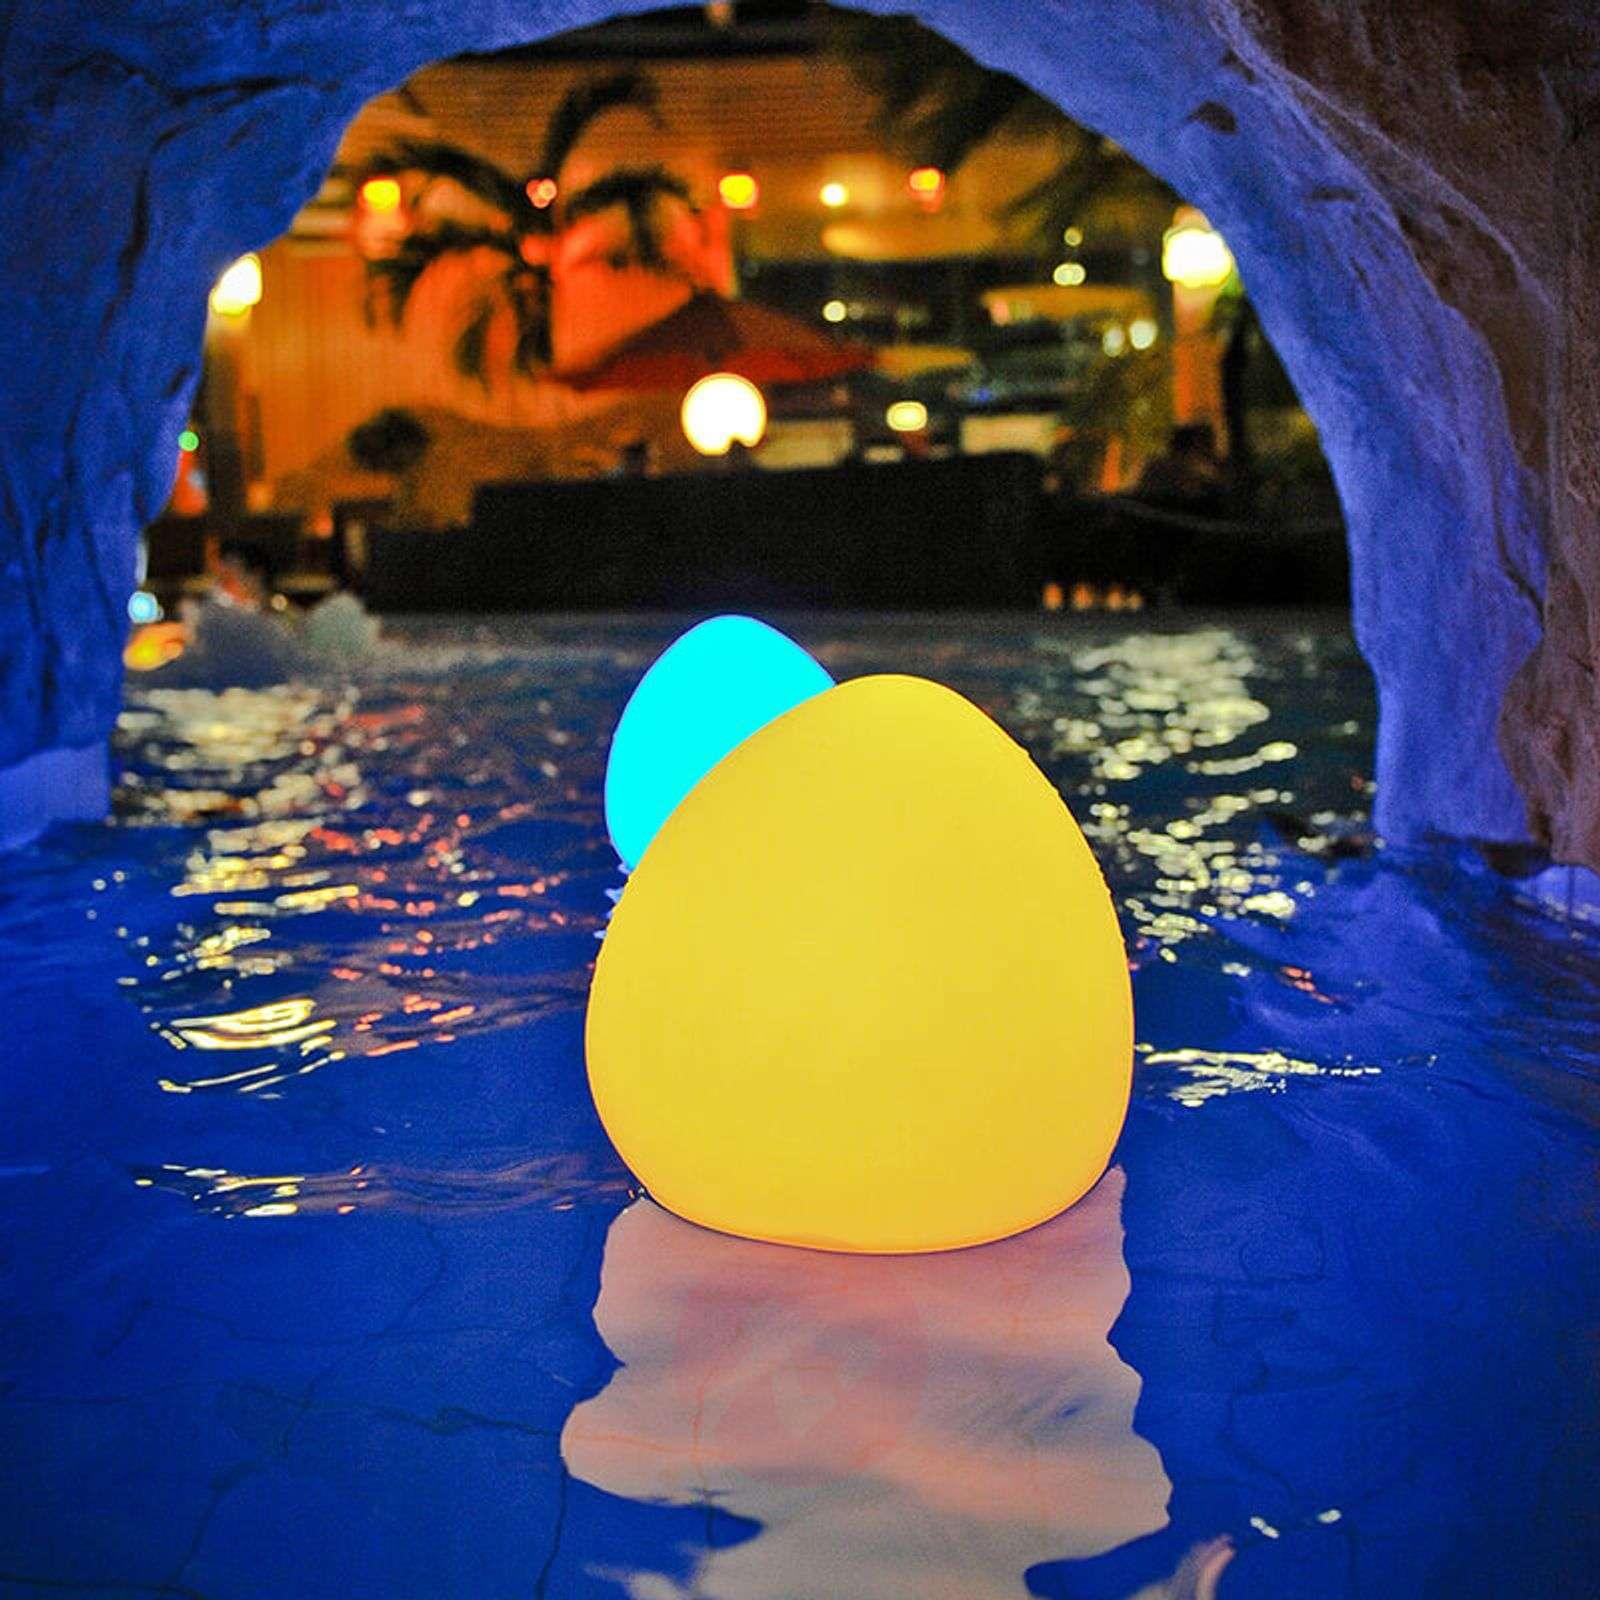 Stone L LED decorative light, controllable via app-8590010-01